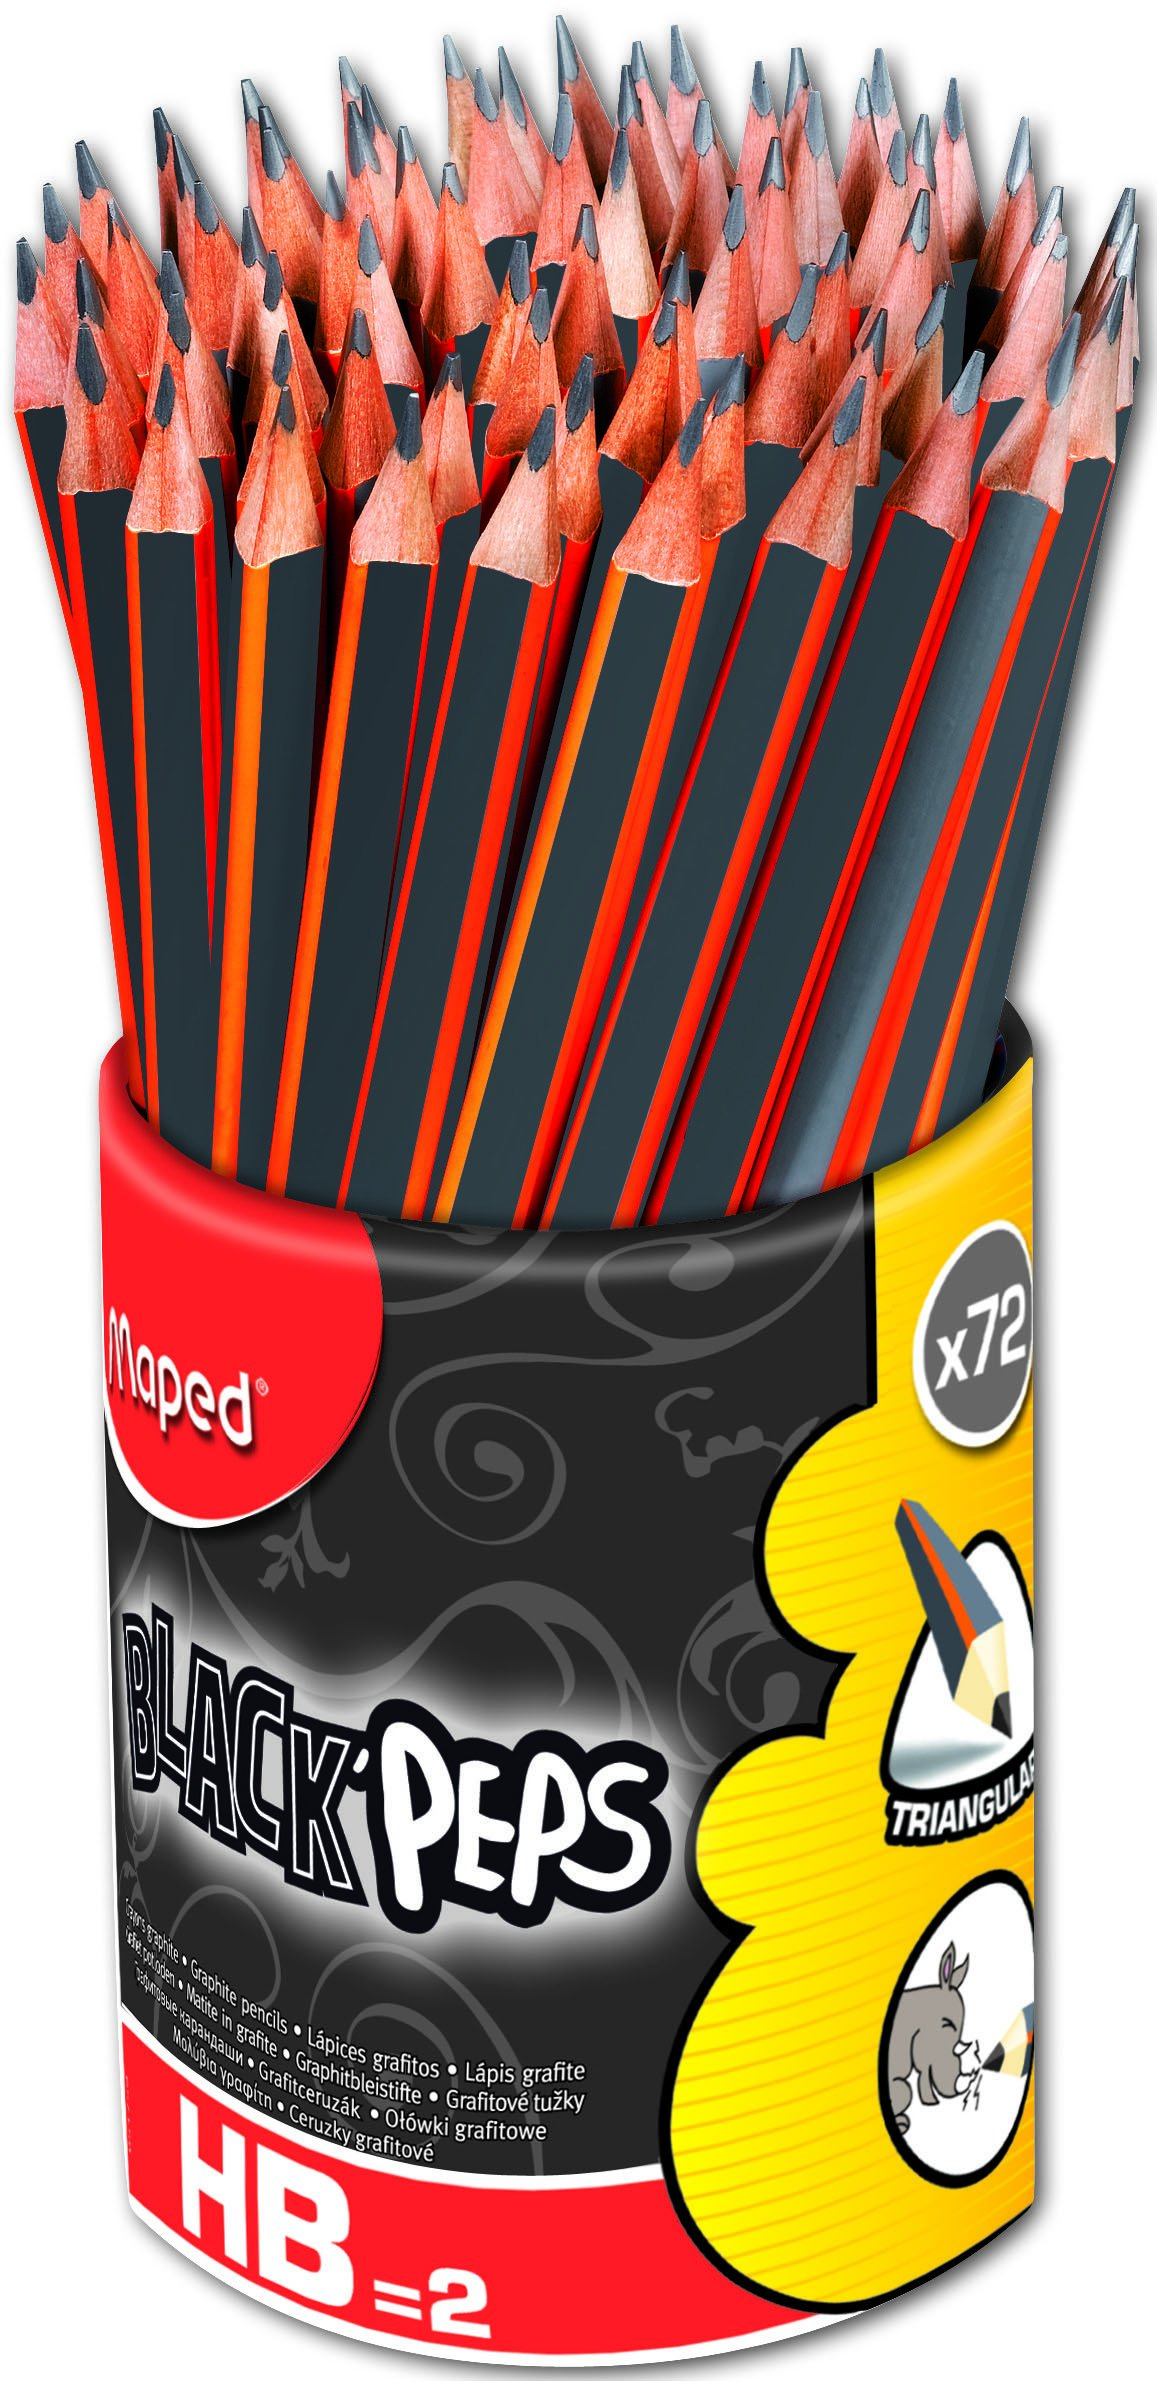 Maped Black'Peps Triangular Graphite #2 Pencils School Pack, Pack of 72 (851759ZV)